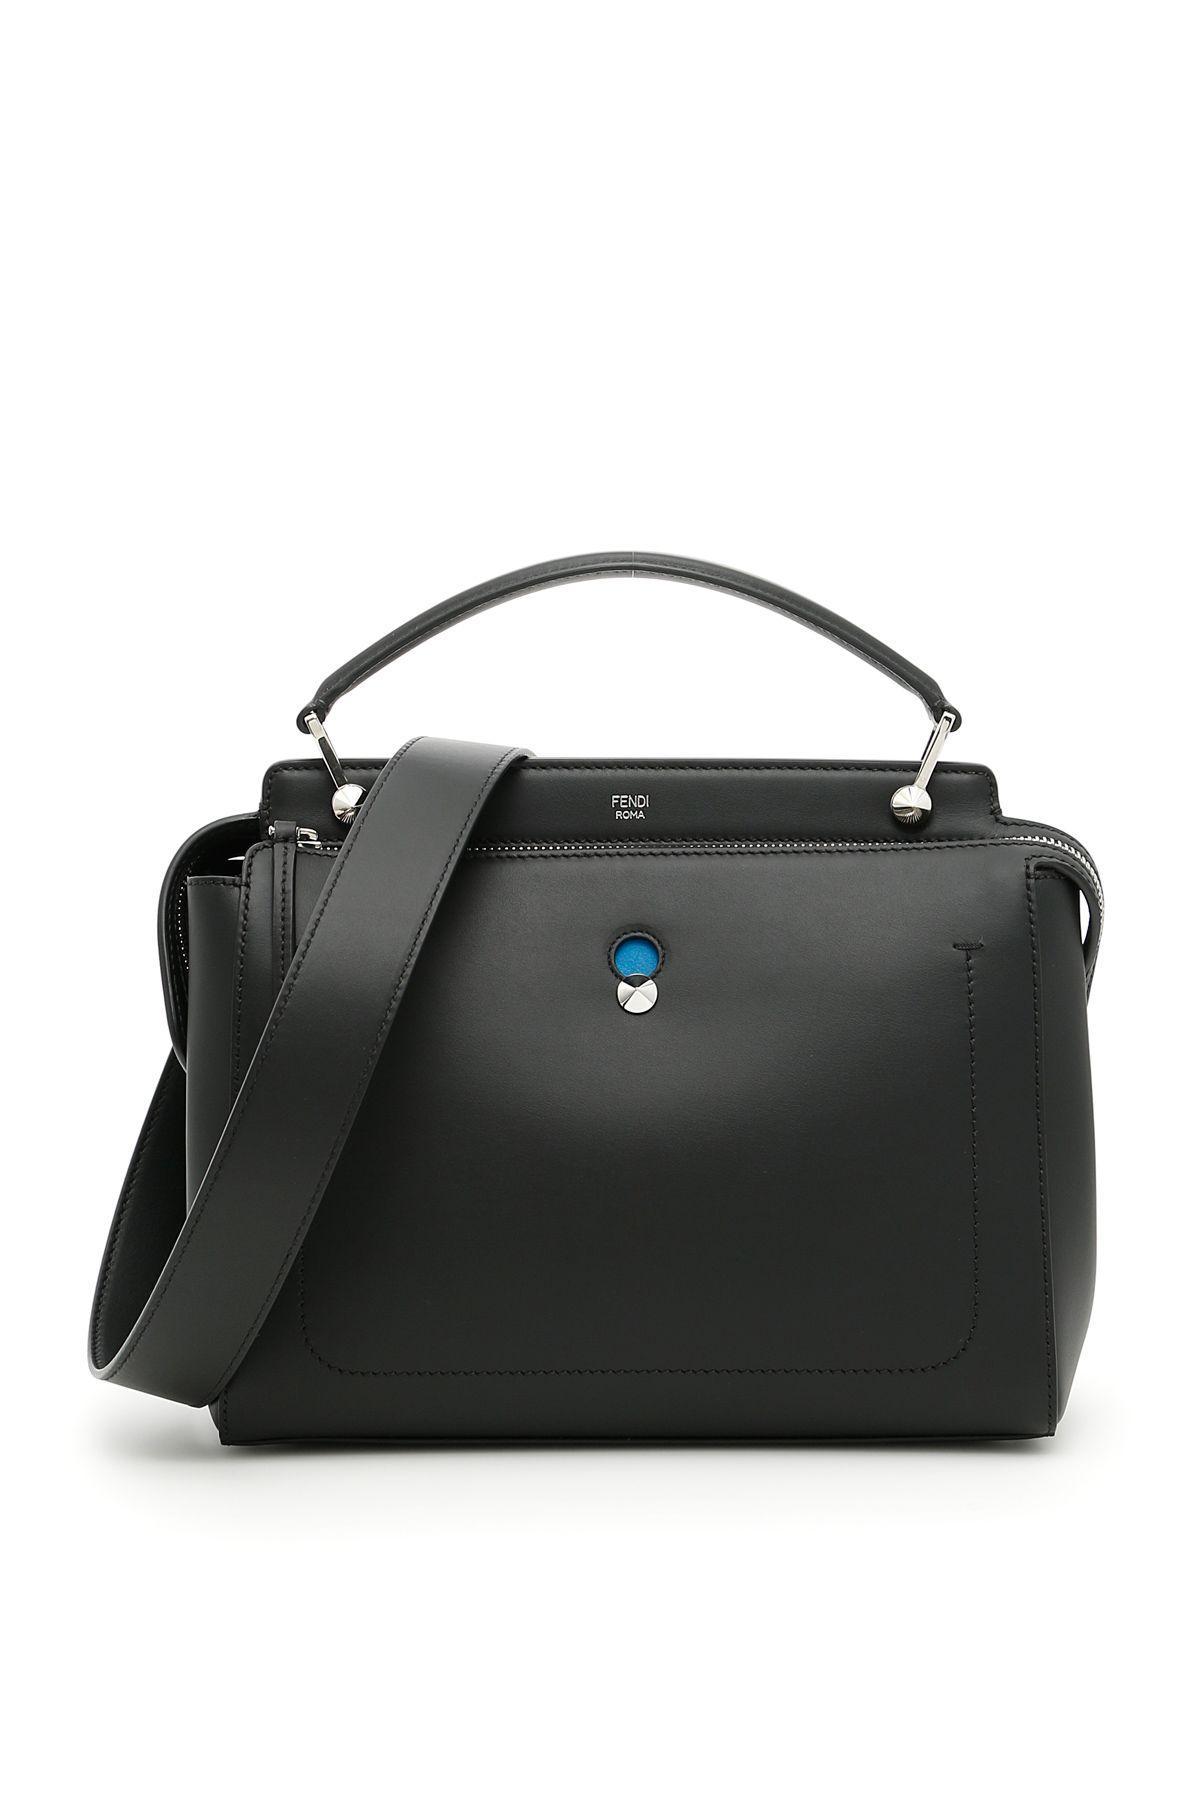 Fendi Dotcom Bag In Nero+blu Royal+pallnero